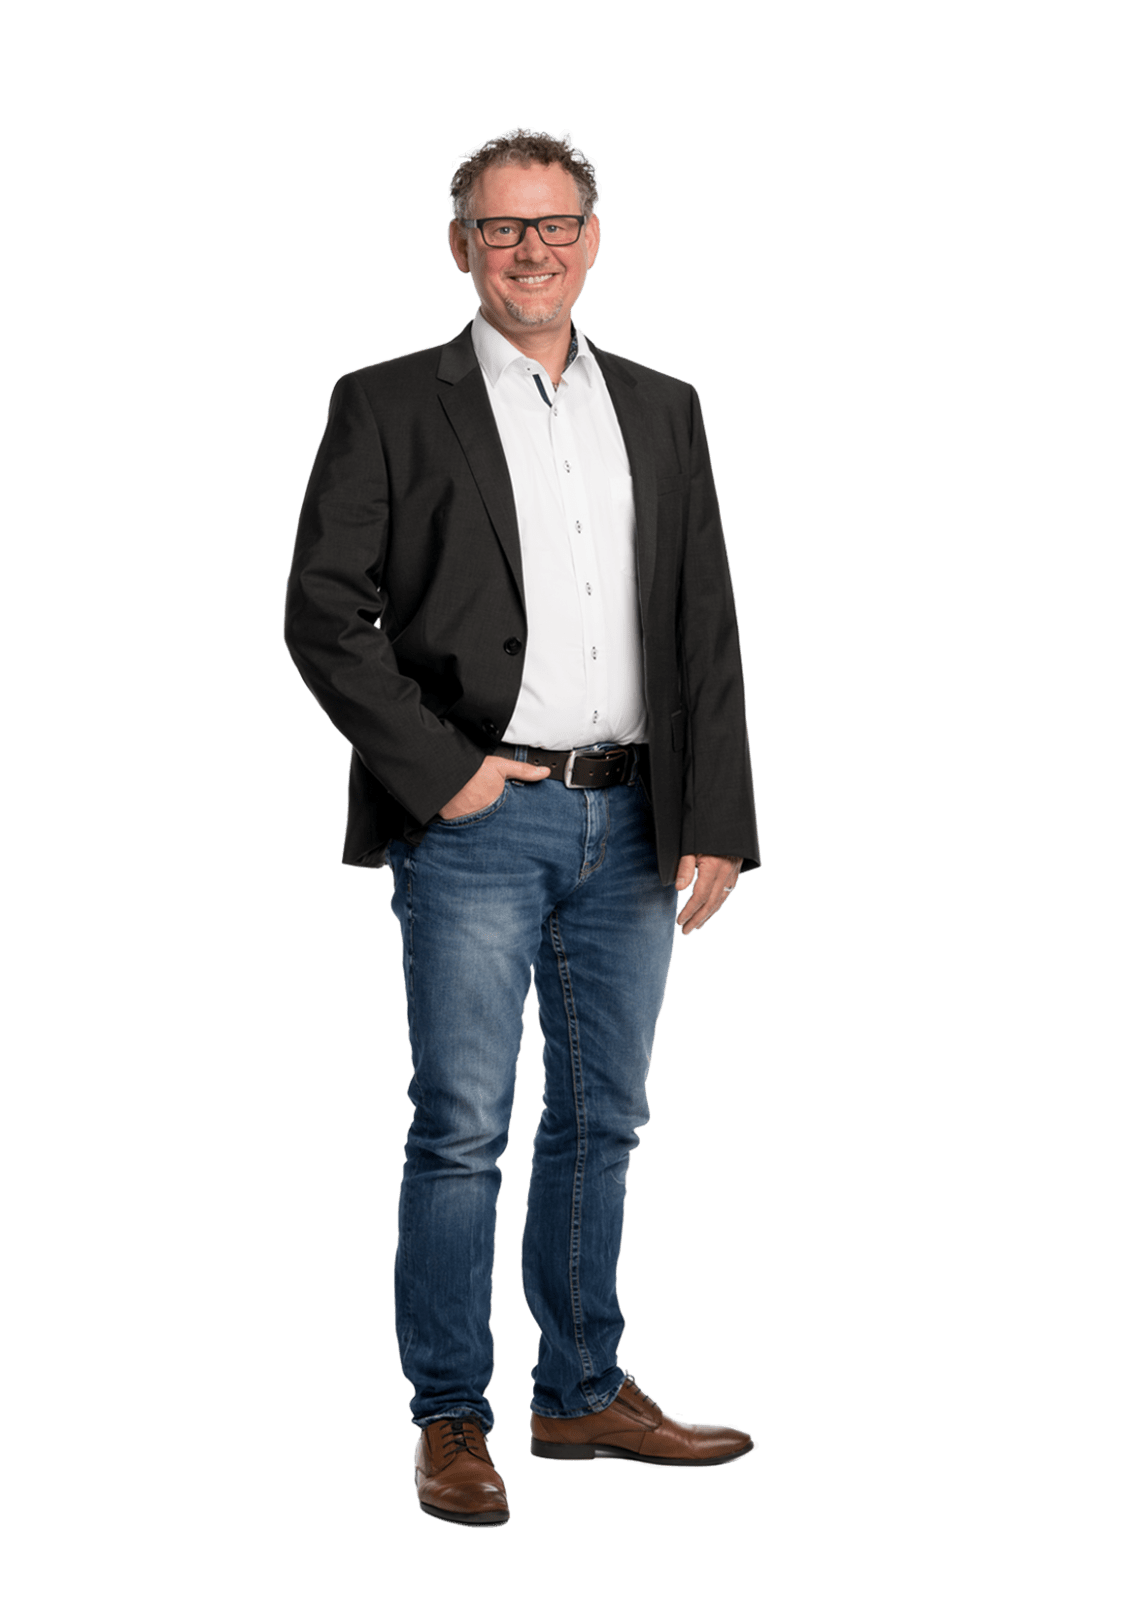 Christoph Hentschel